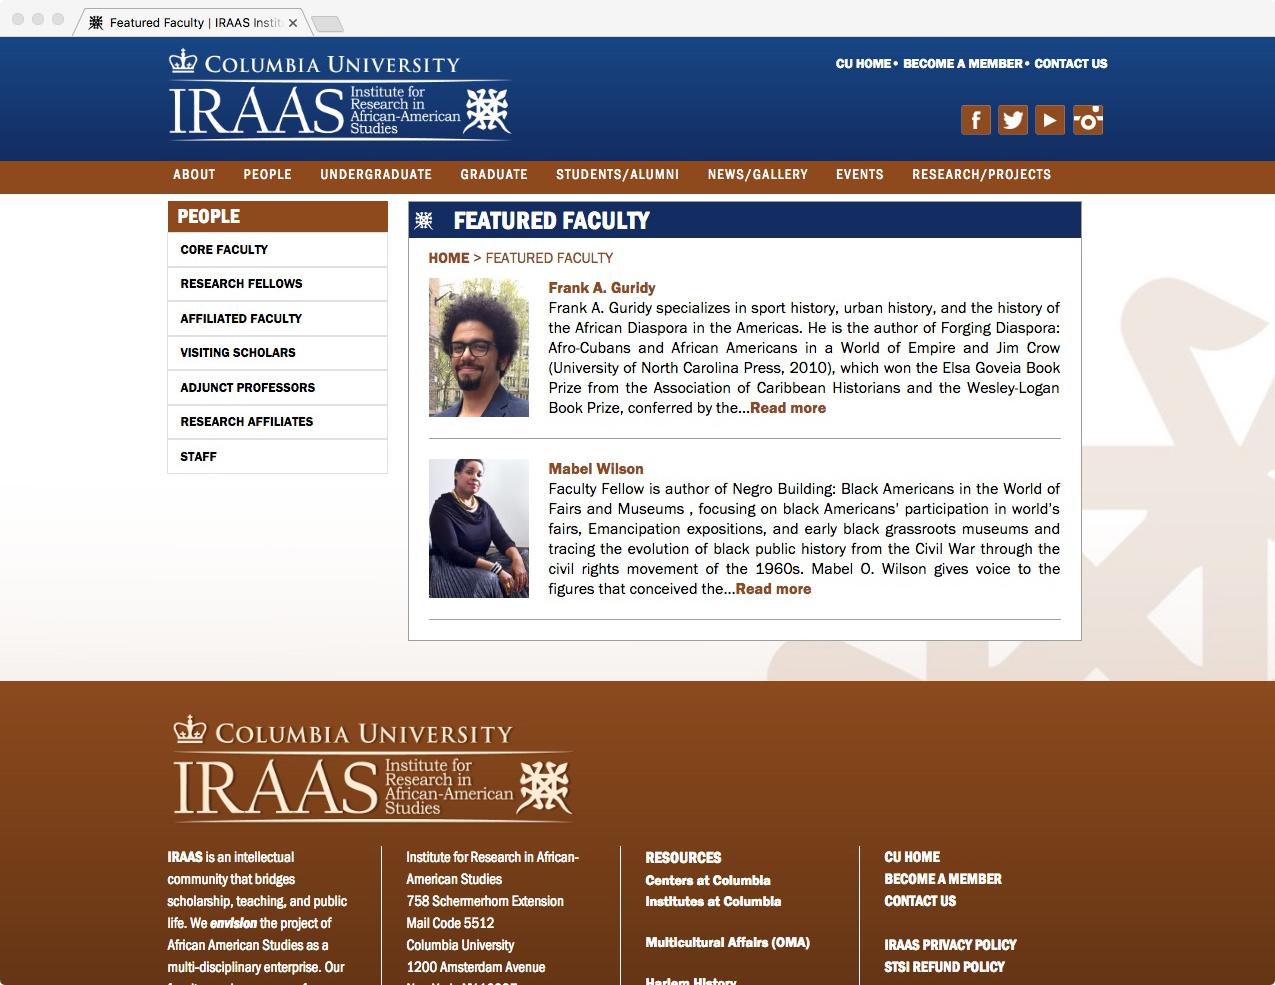 Image of screenshot of Columbia University IRAAS website